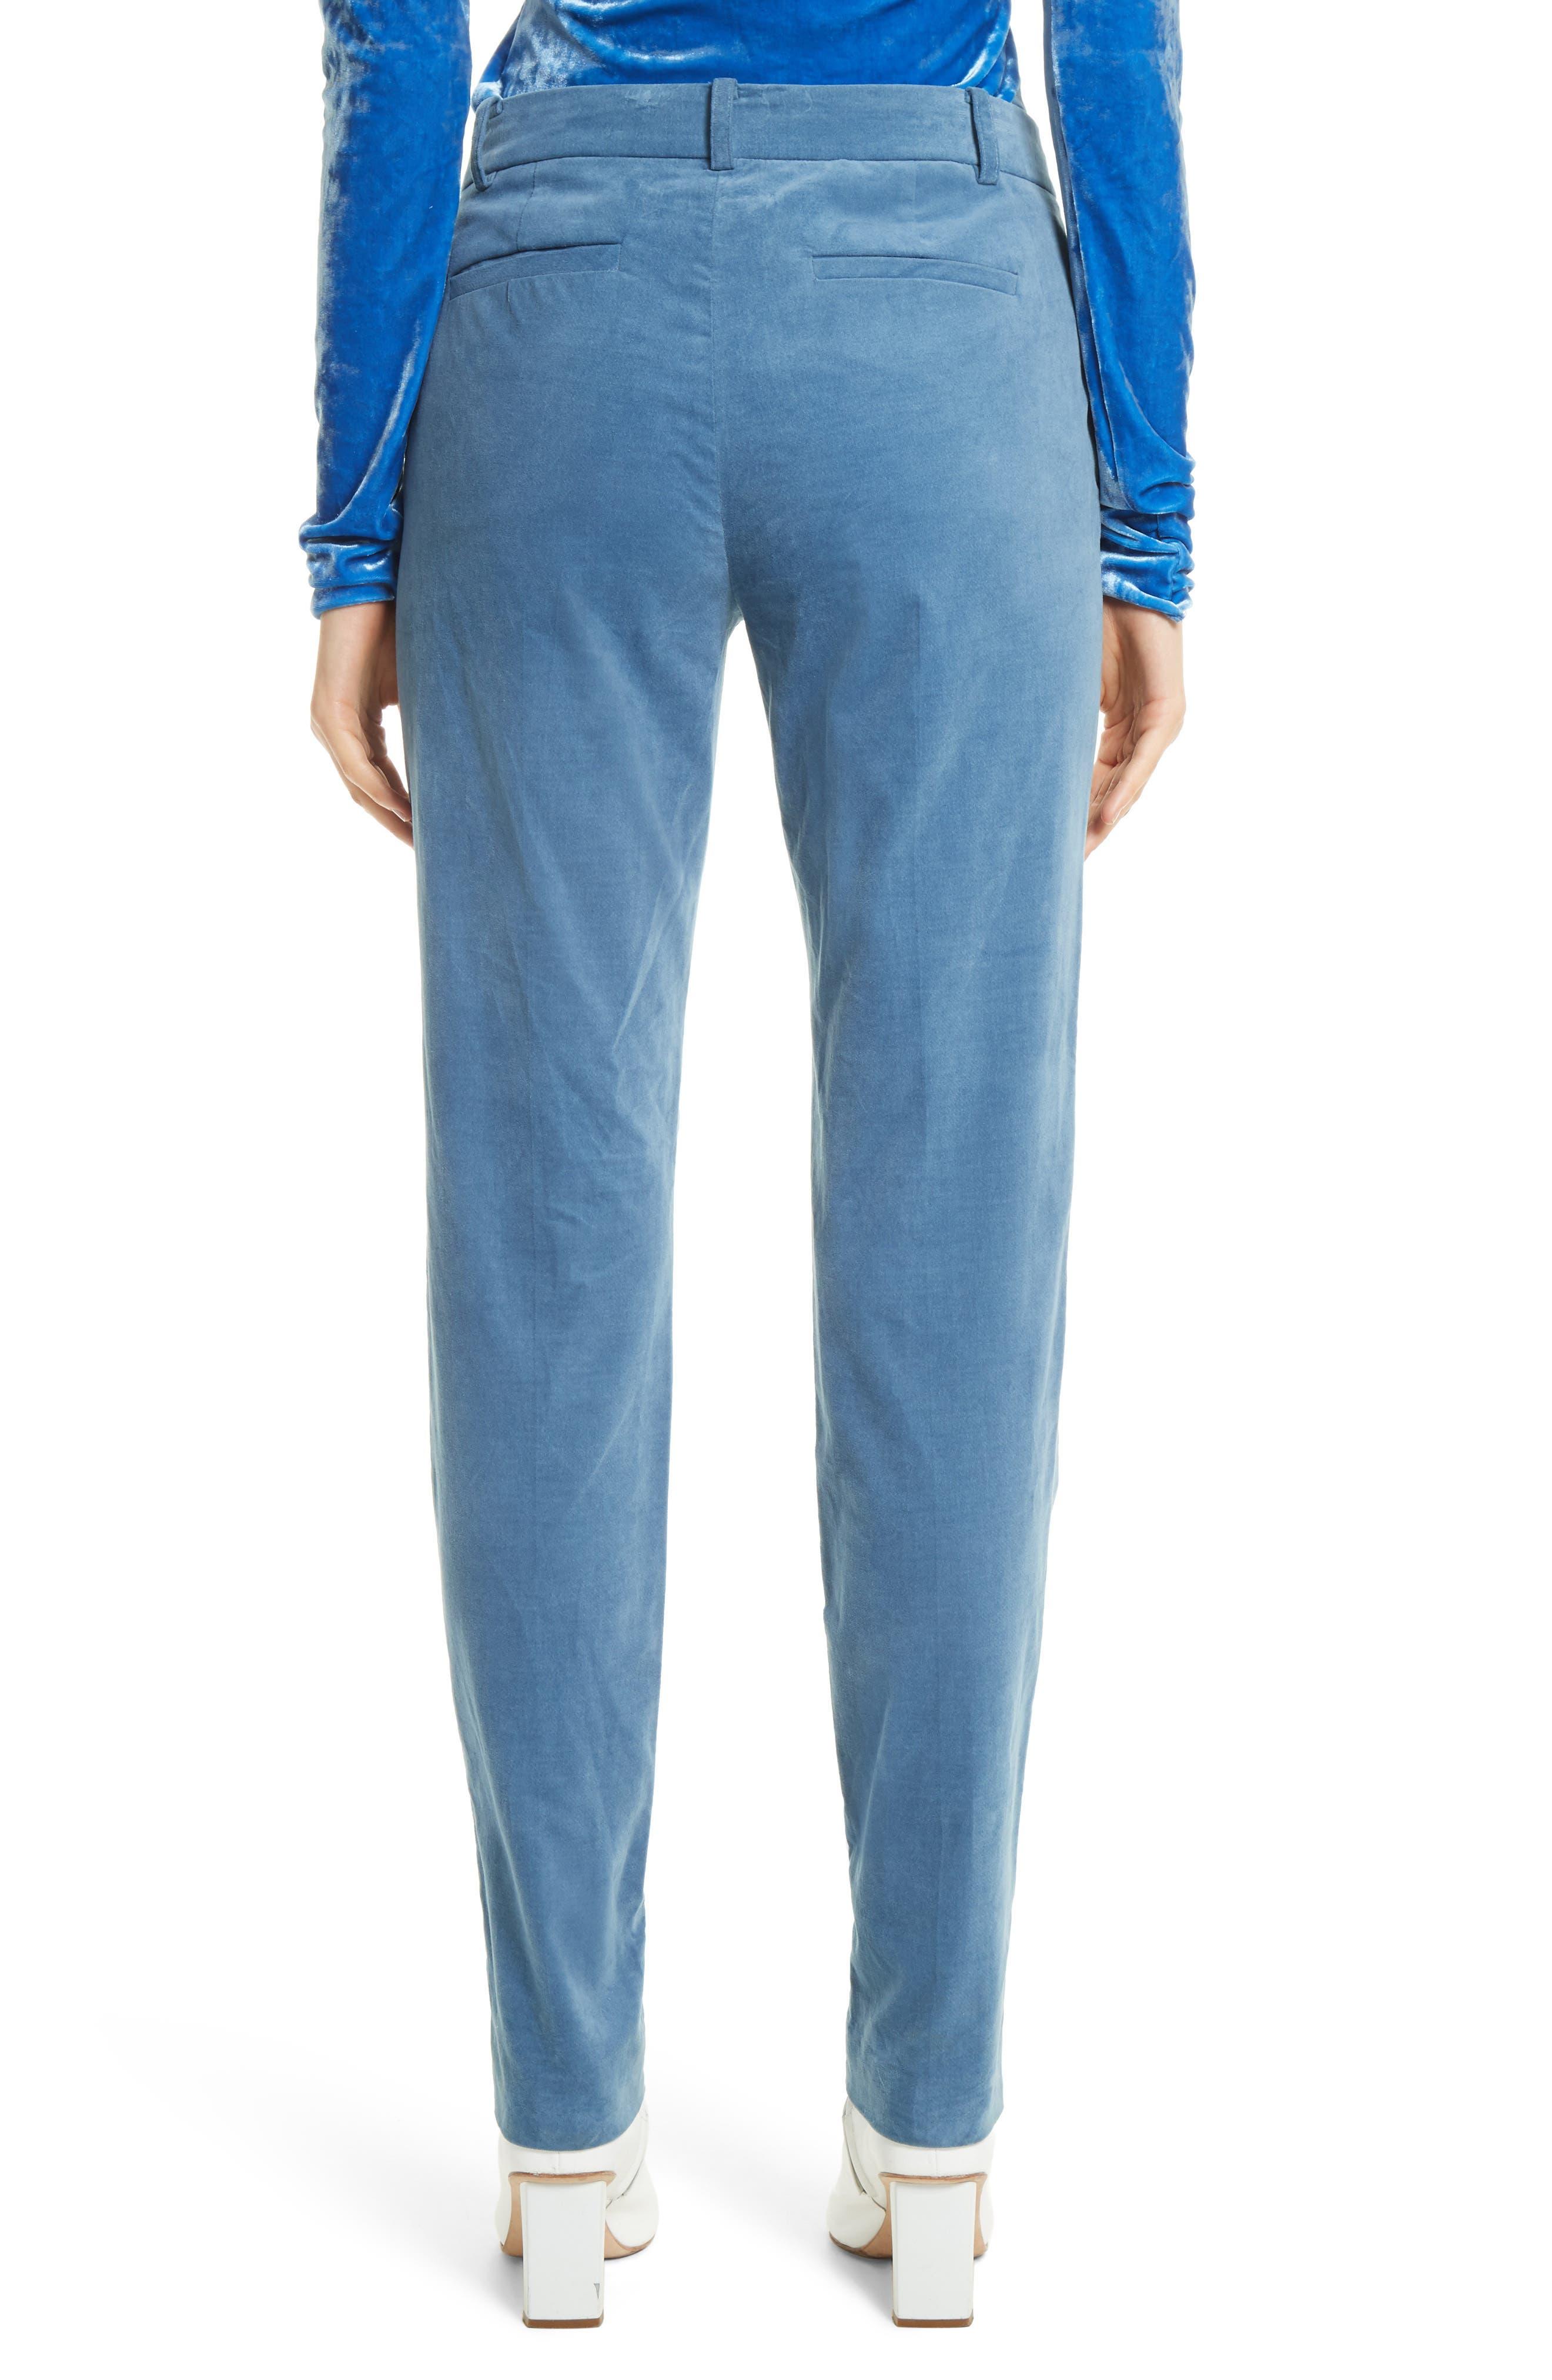 Moleskin Stretch Cotton Skinny Pants,                             Alternate thumbnail 3, color,                             Blue